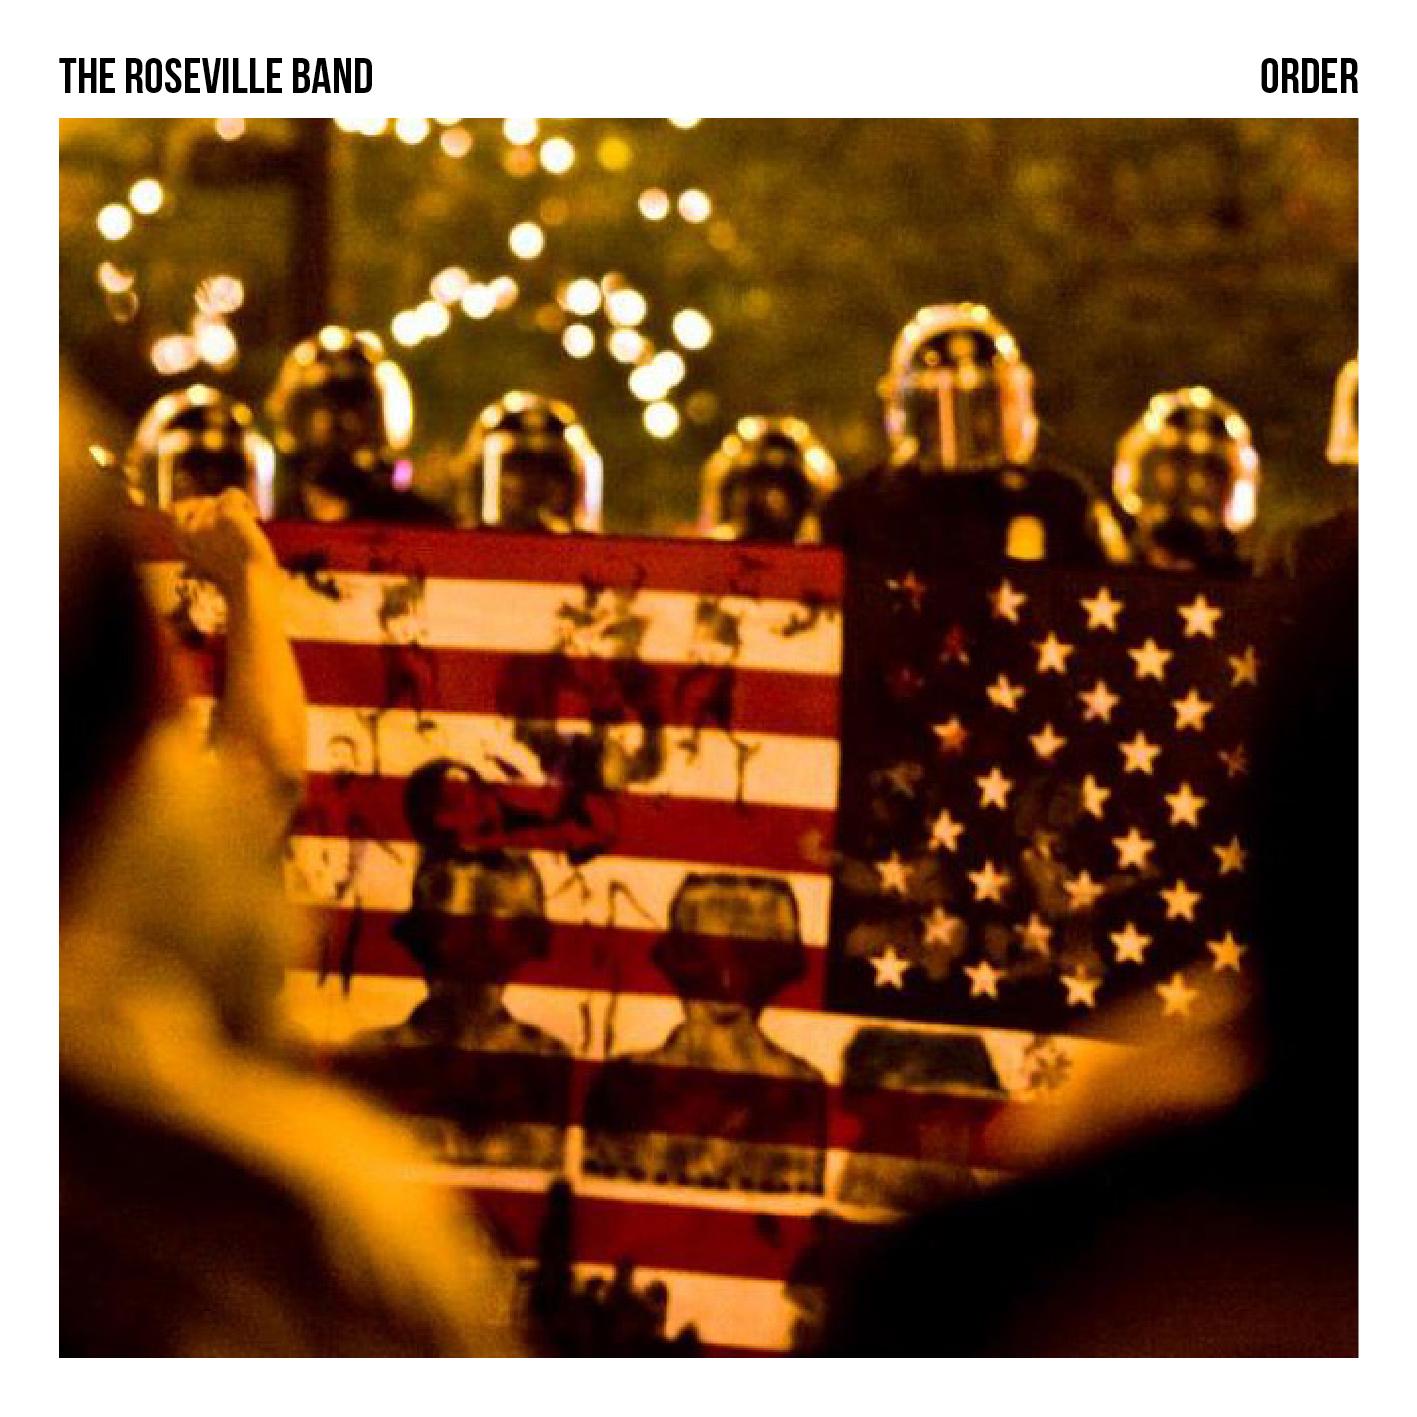 Order - The Roseville Band